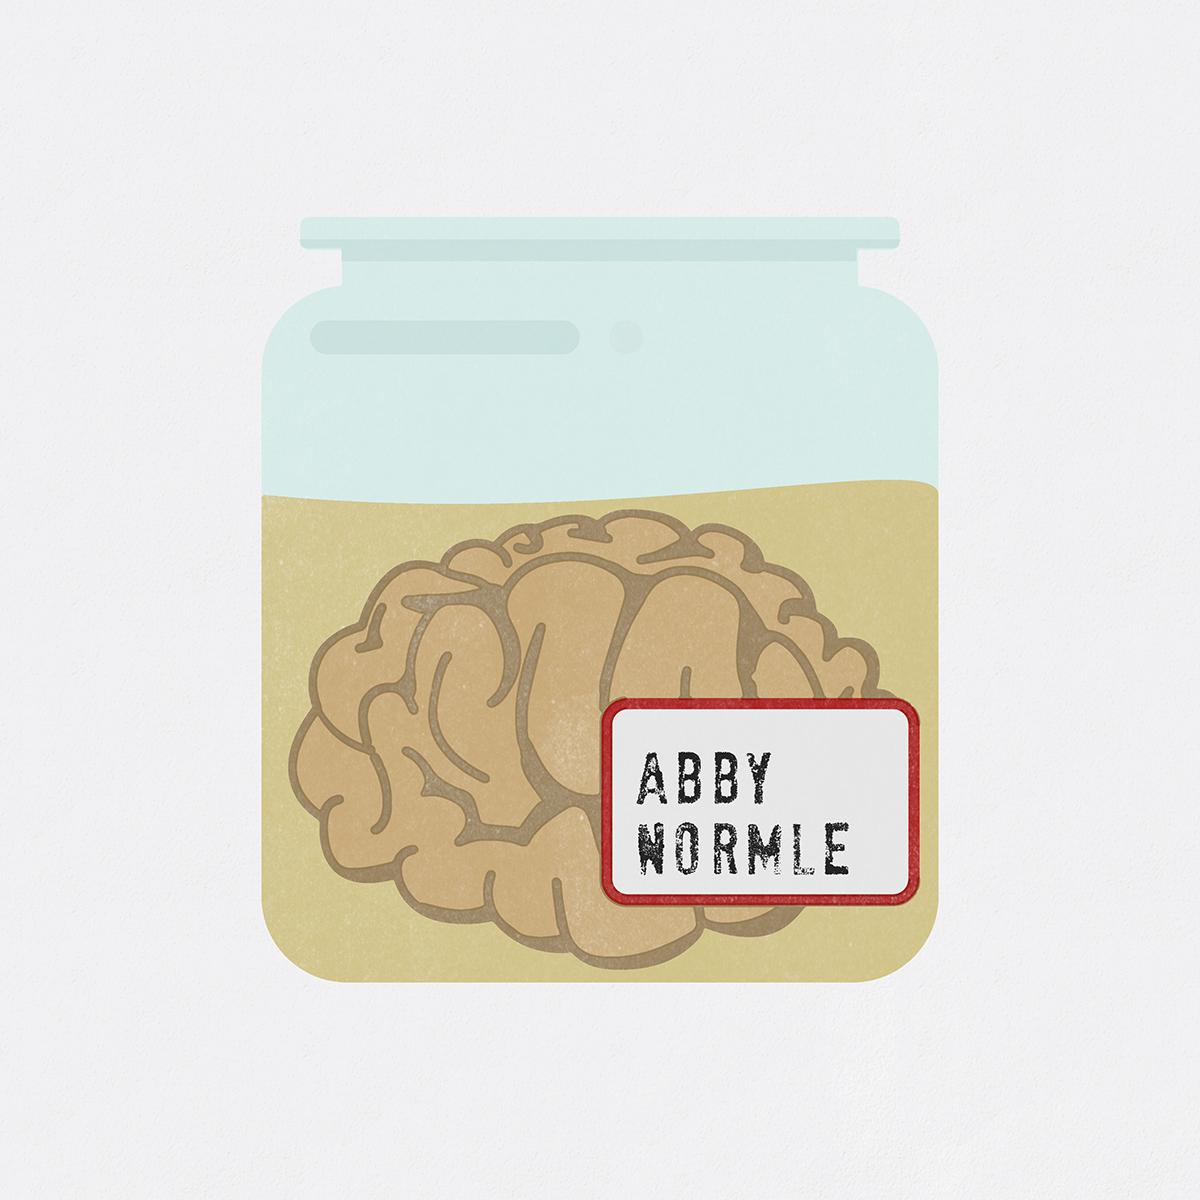 AbbyNormalIG.jpg